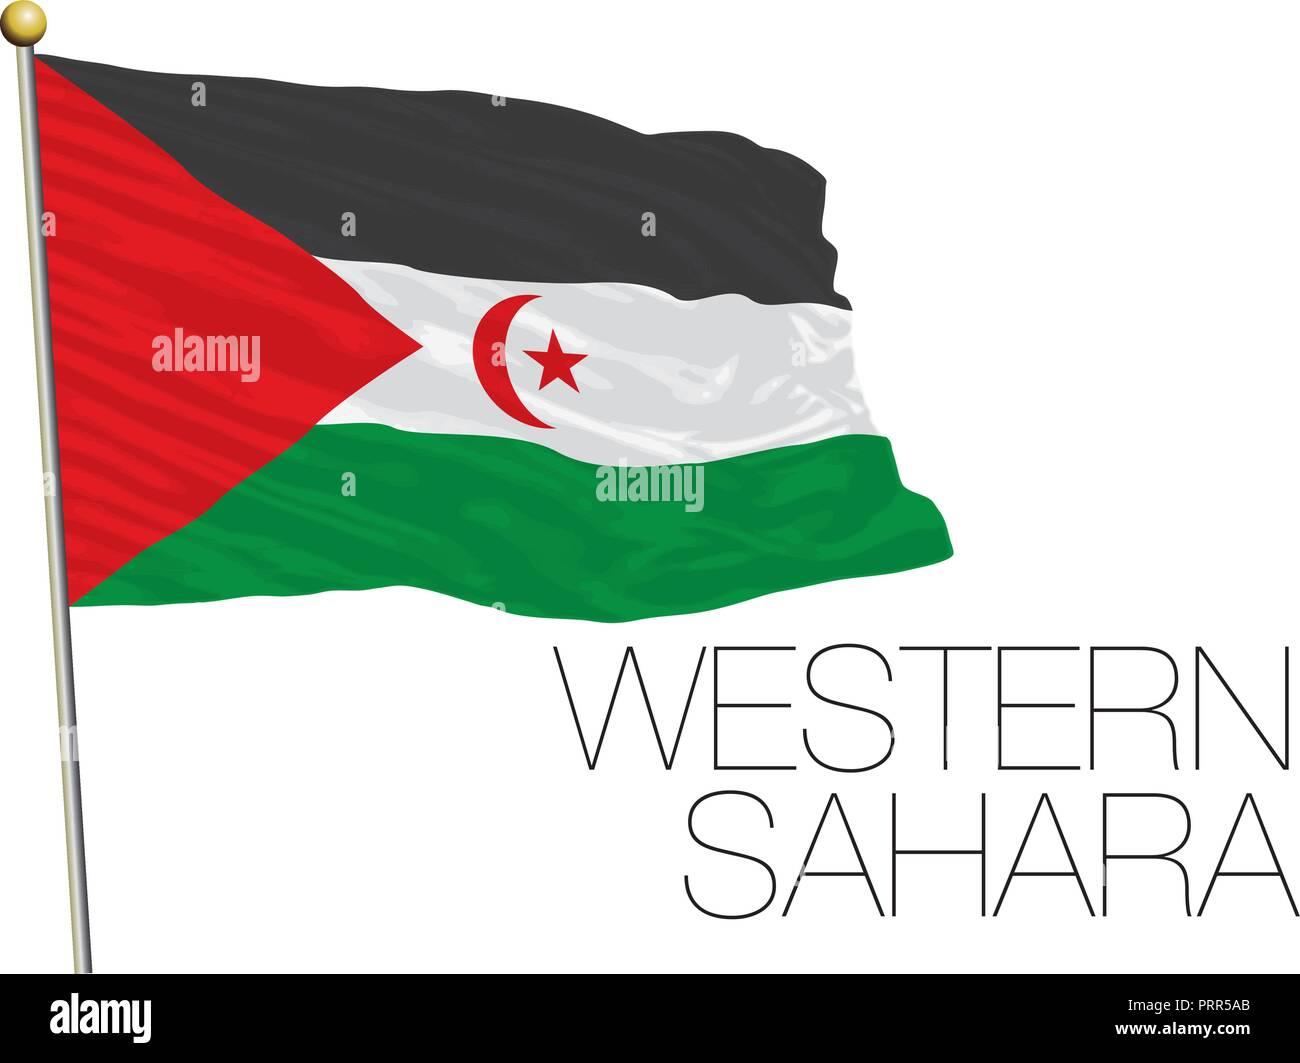 Western Sahara official flag, vector illustration - Stock Image